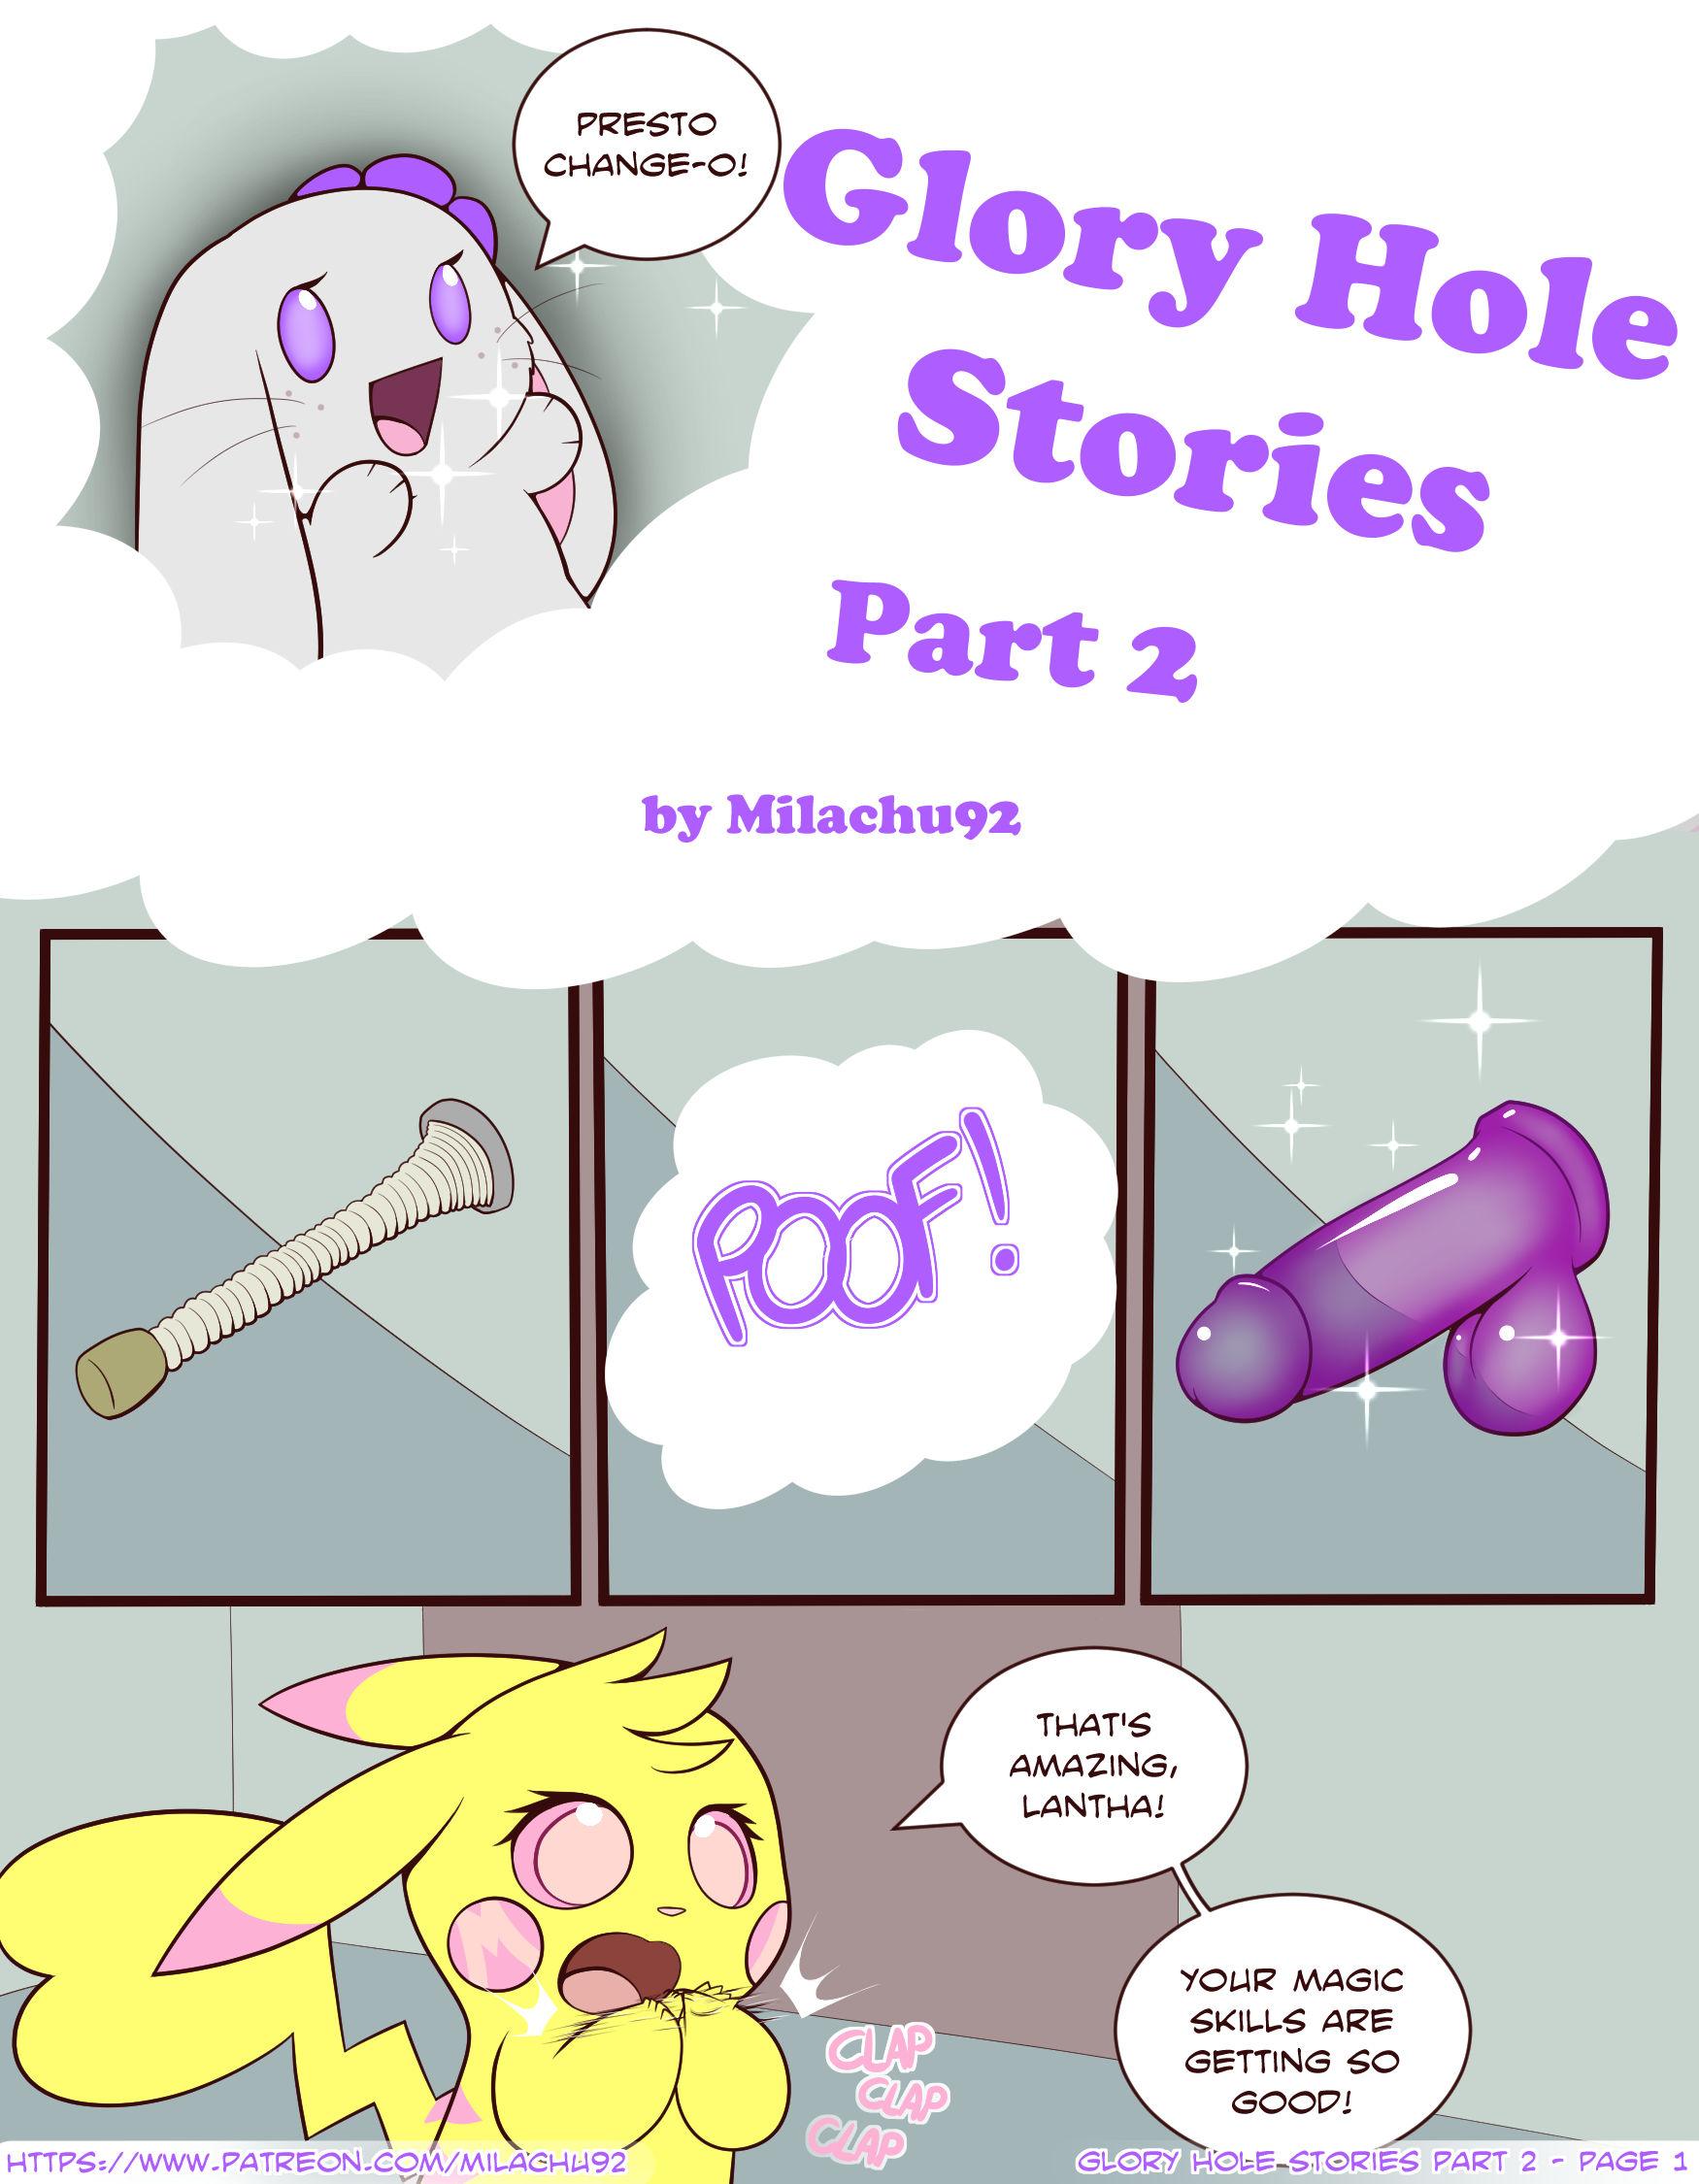 Glory hole stories 2 hentai manga picture 1